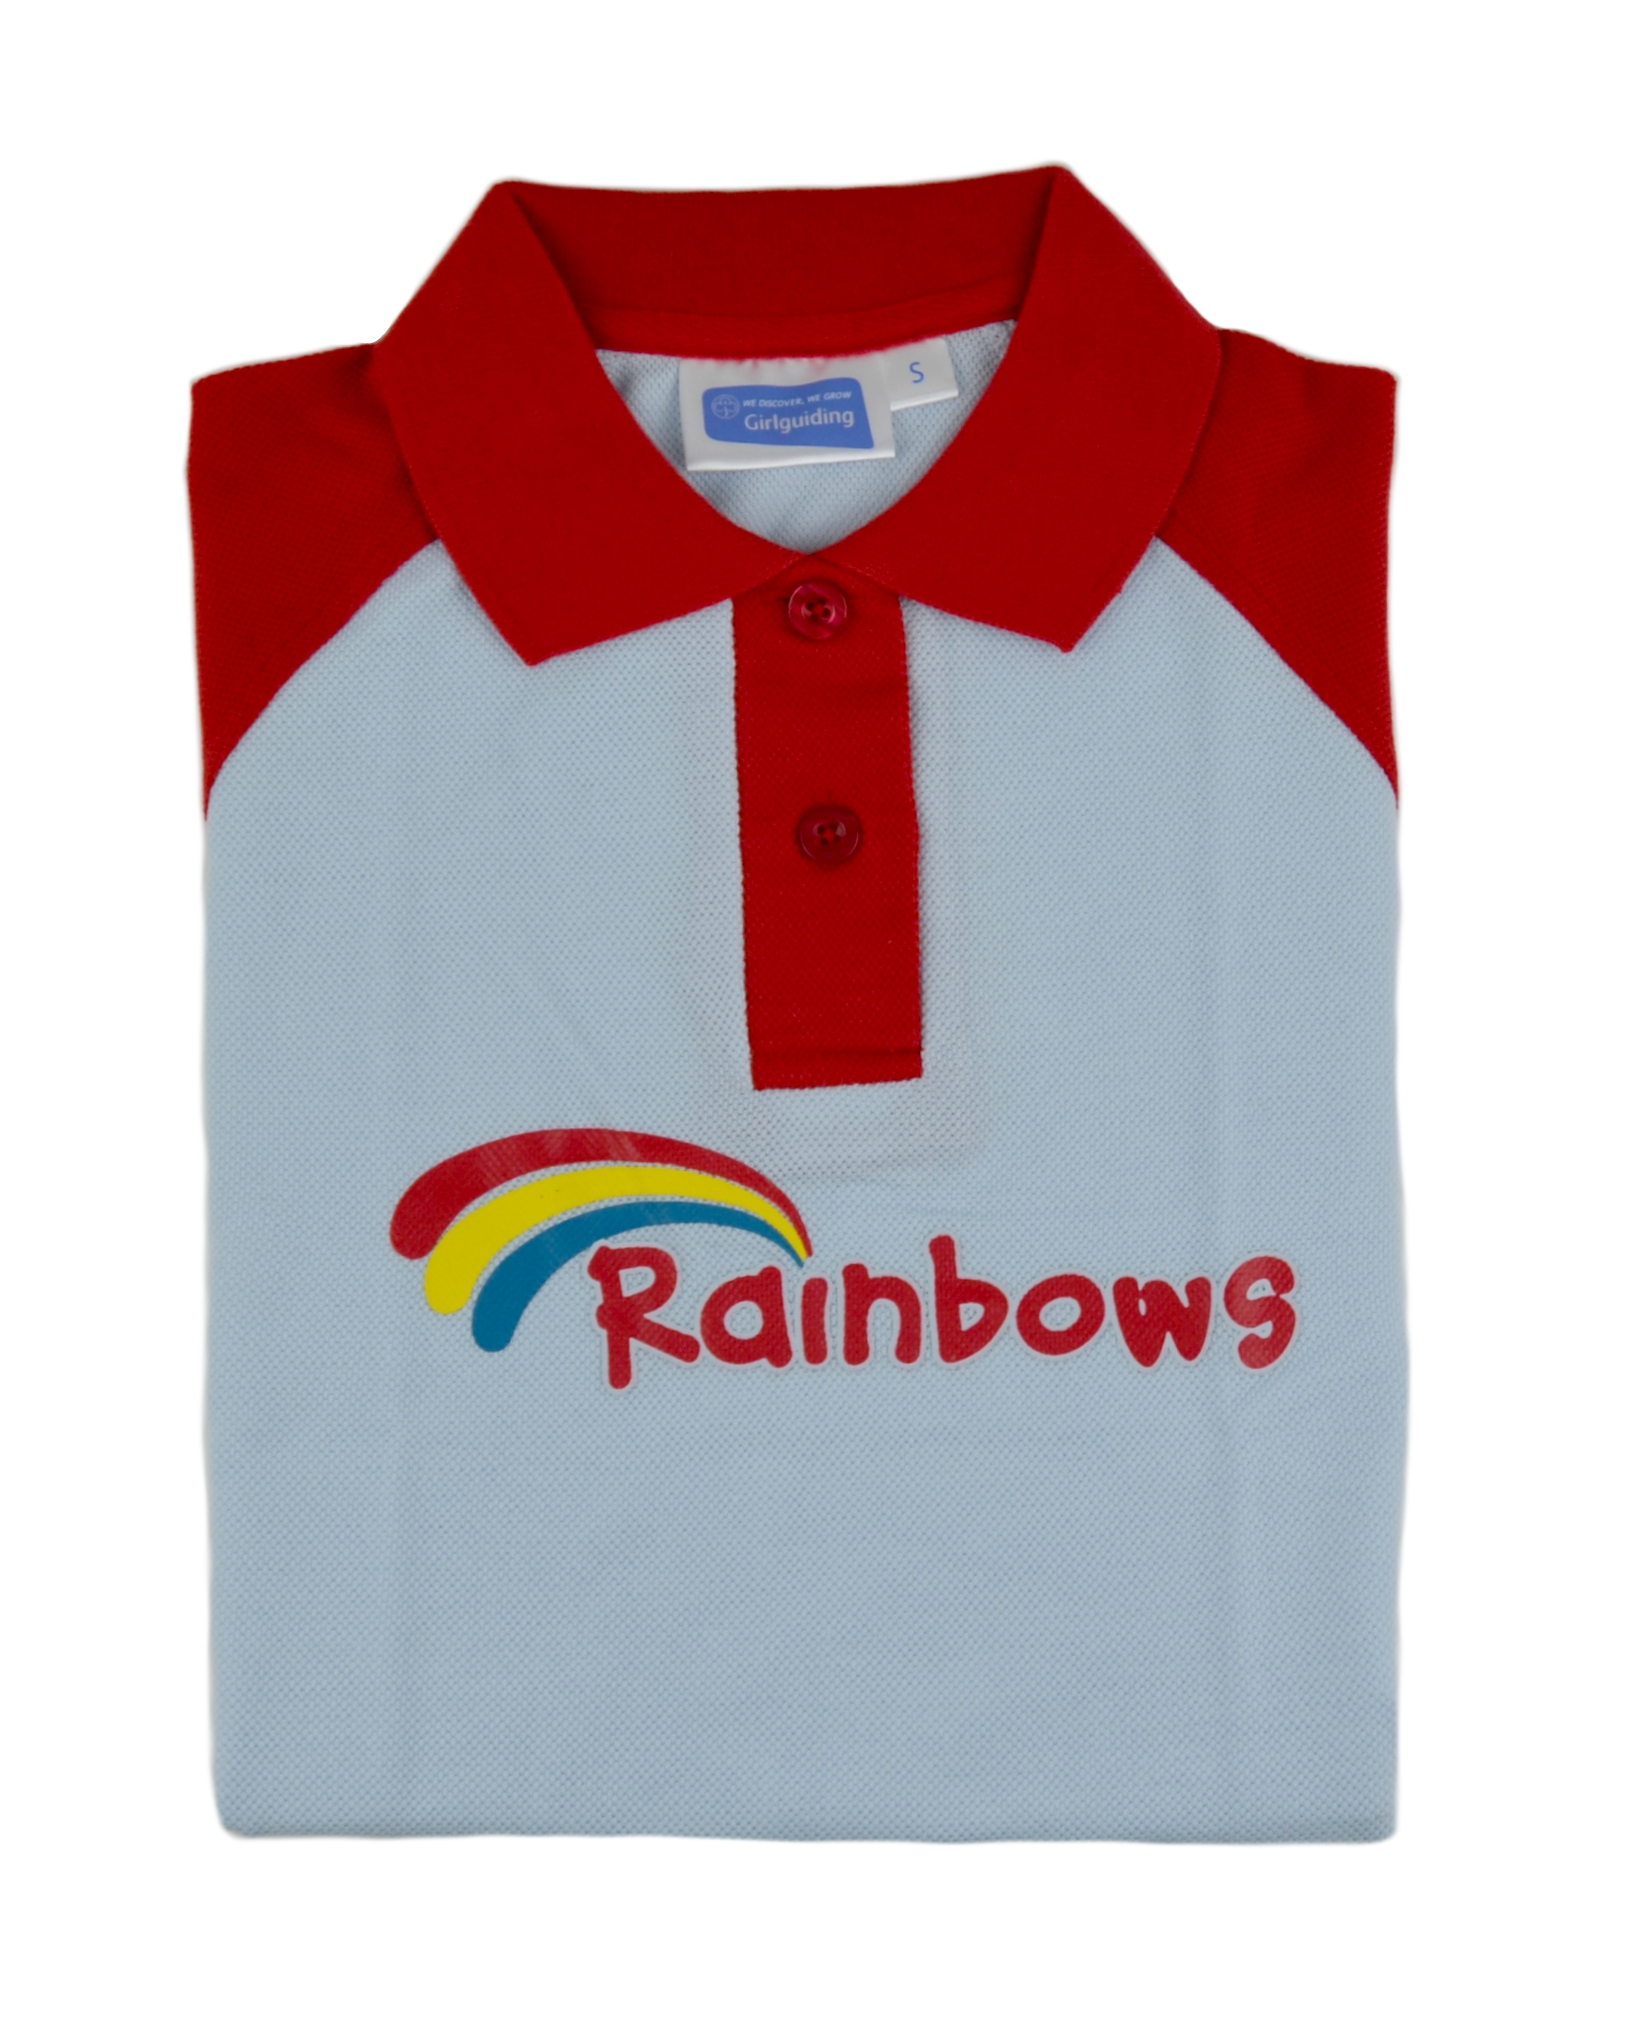 f79f4ed98 Rainbows Polo Shirt - Whittakers School Wear